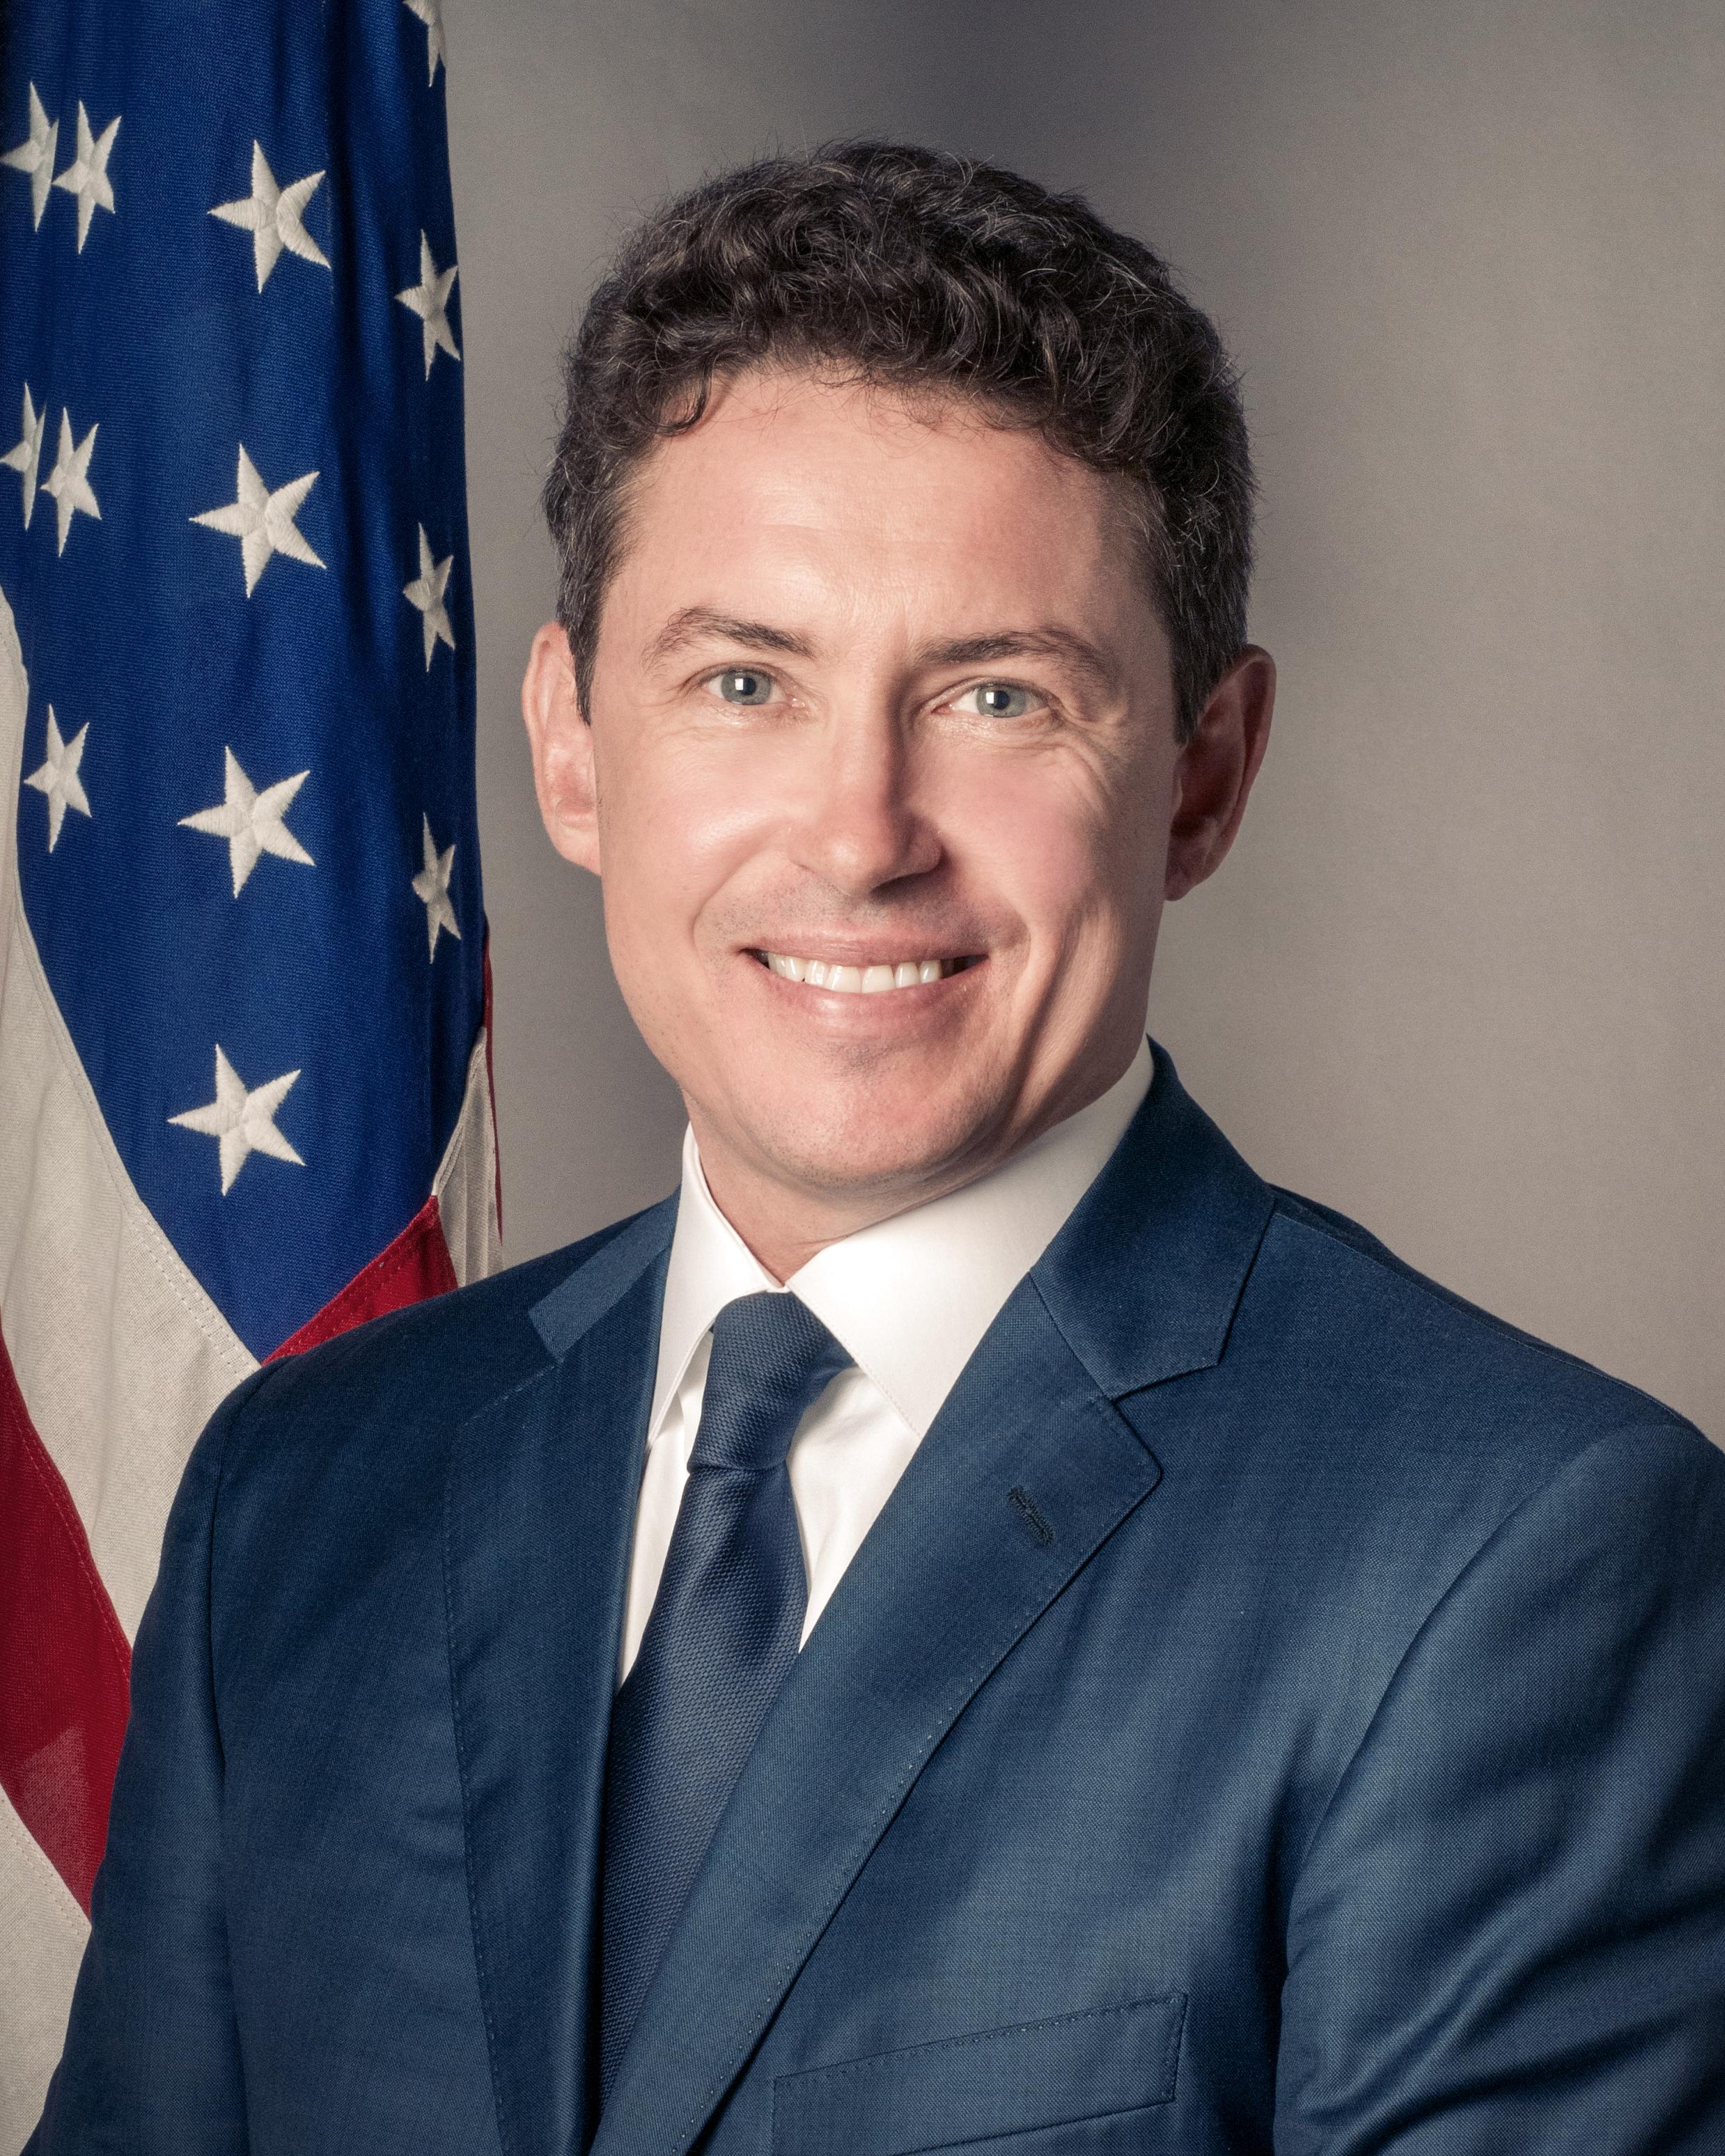 How to become a U.S. Ambassador?